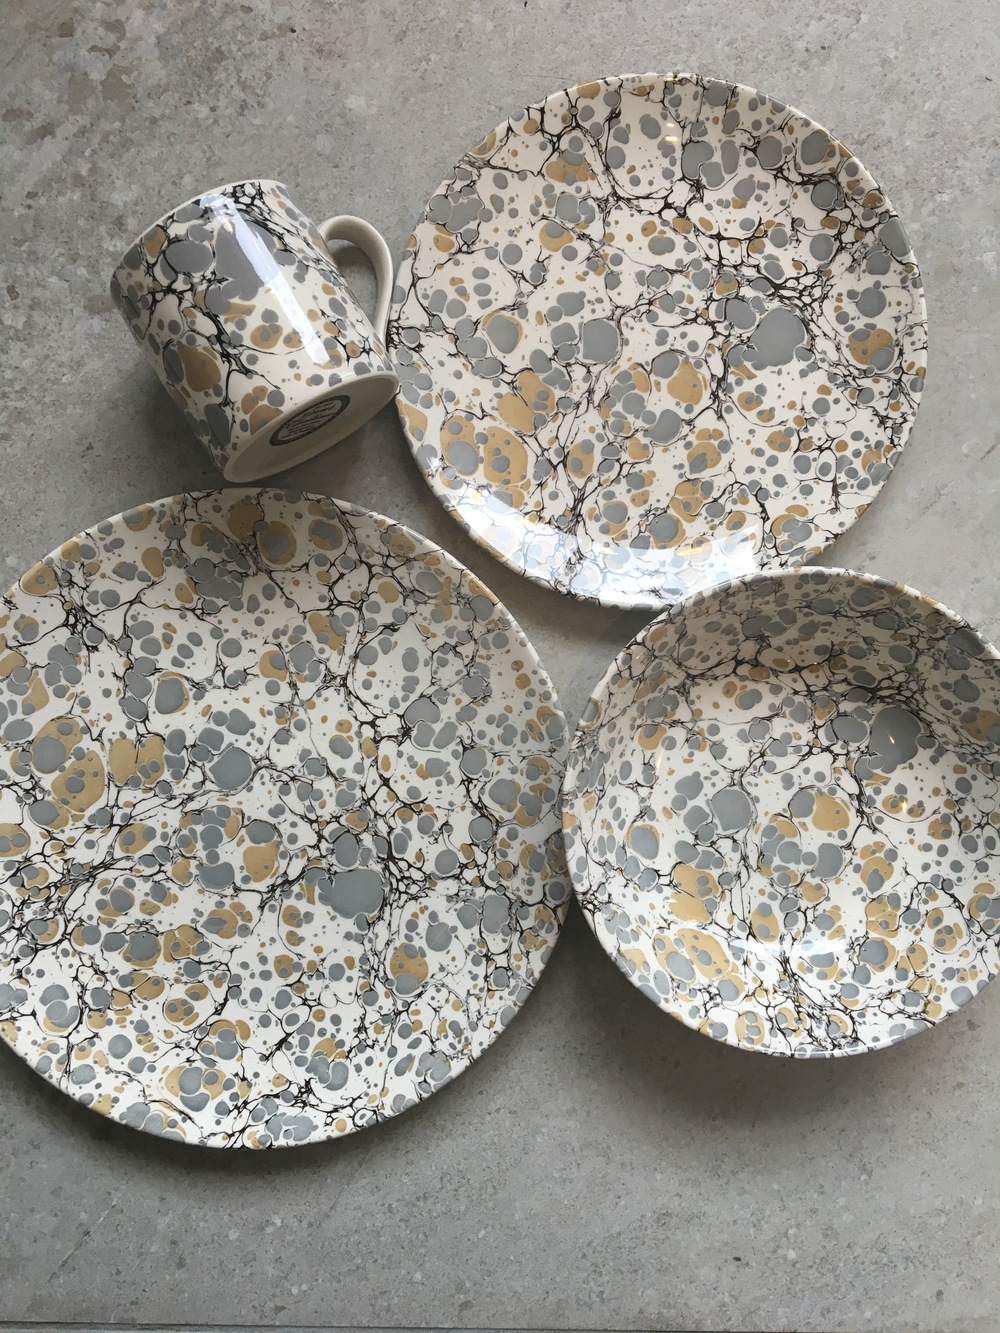 Gold Grey u0026 White Marble Effect Small Dinner Plate & Gold Grey u0026 White Marble Effect Small Dinner Plate u2014 Omnis